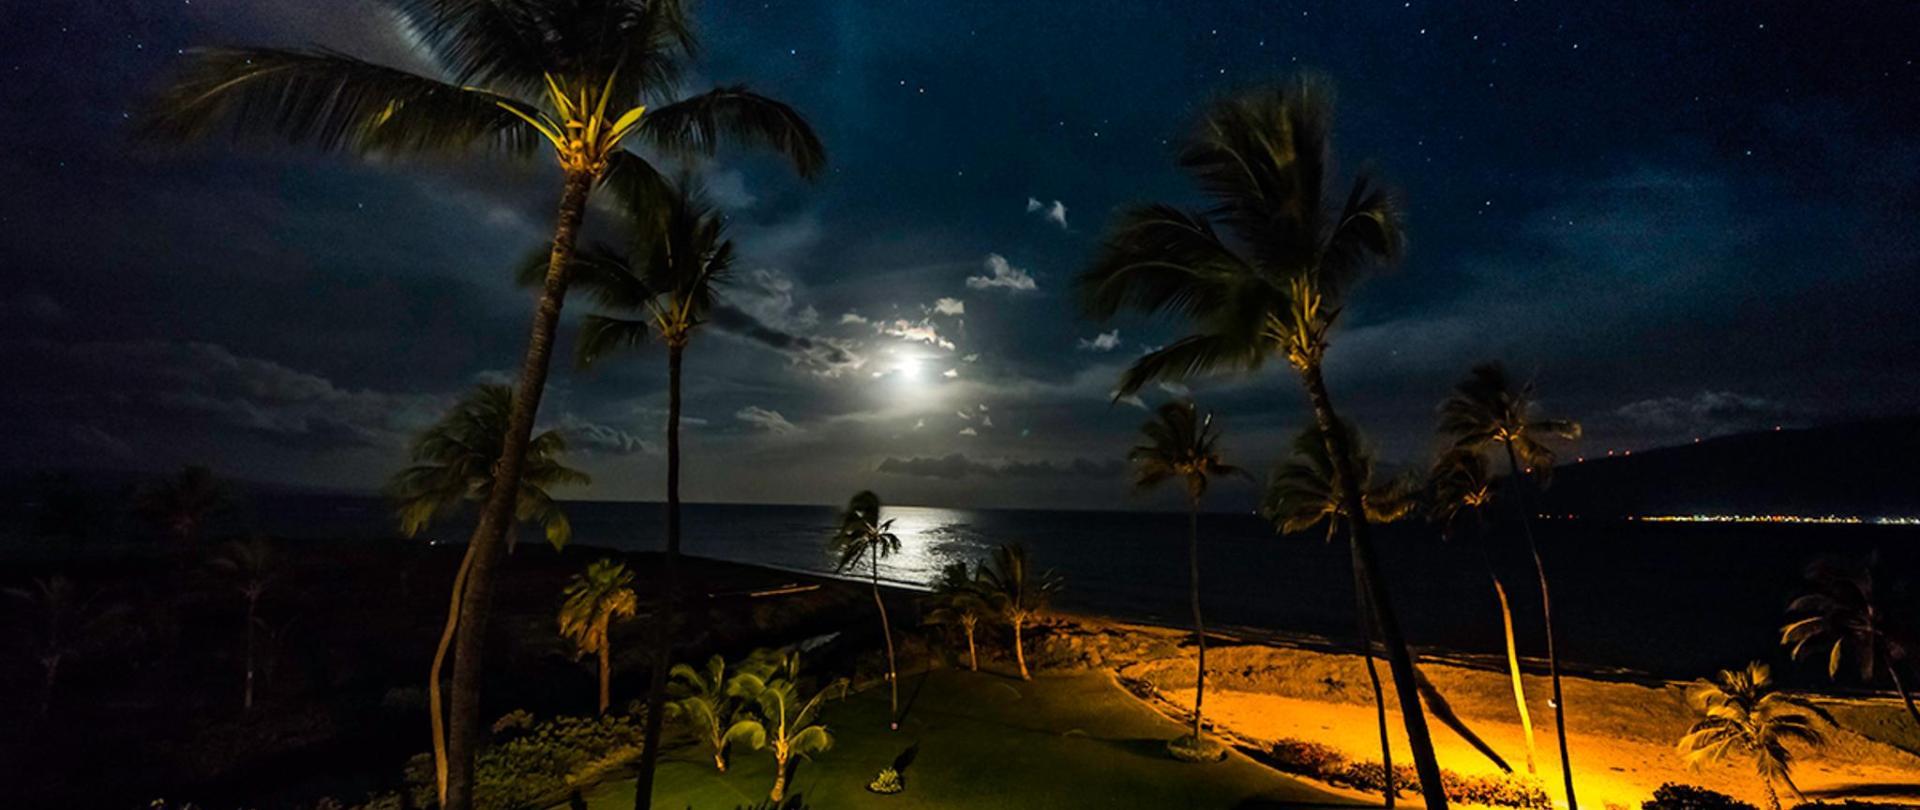 KL 501 night image.jpg